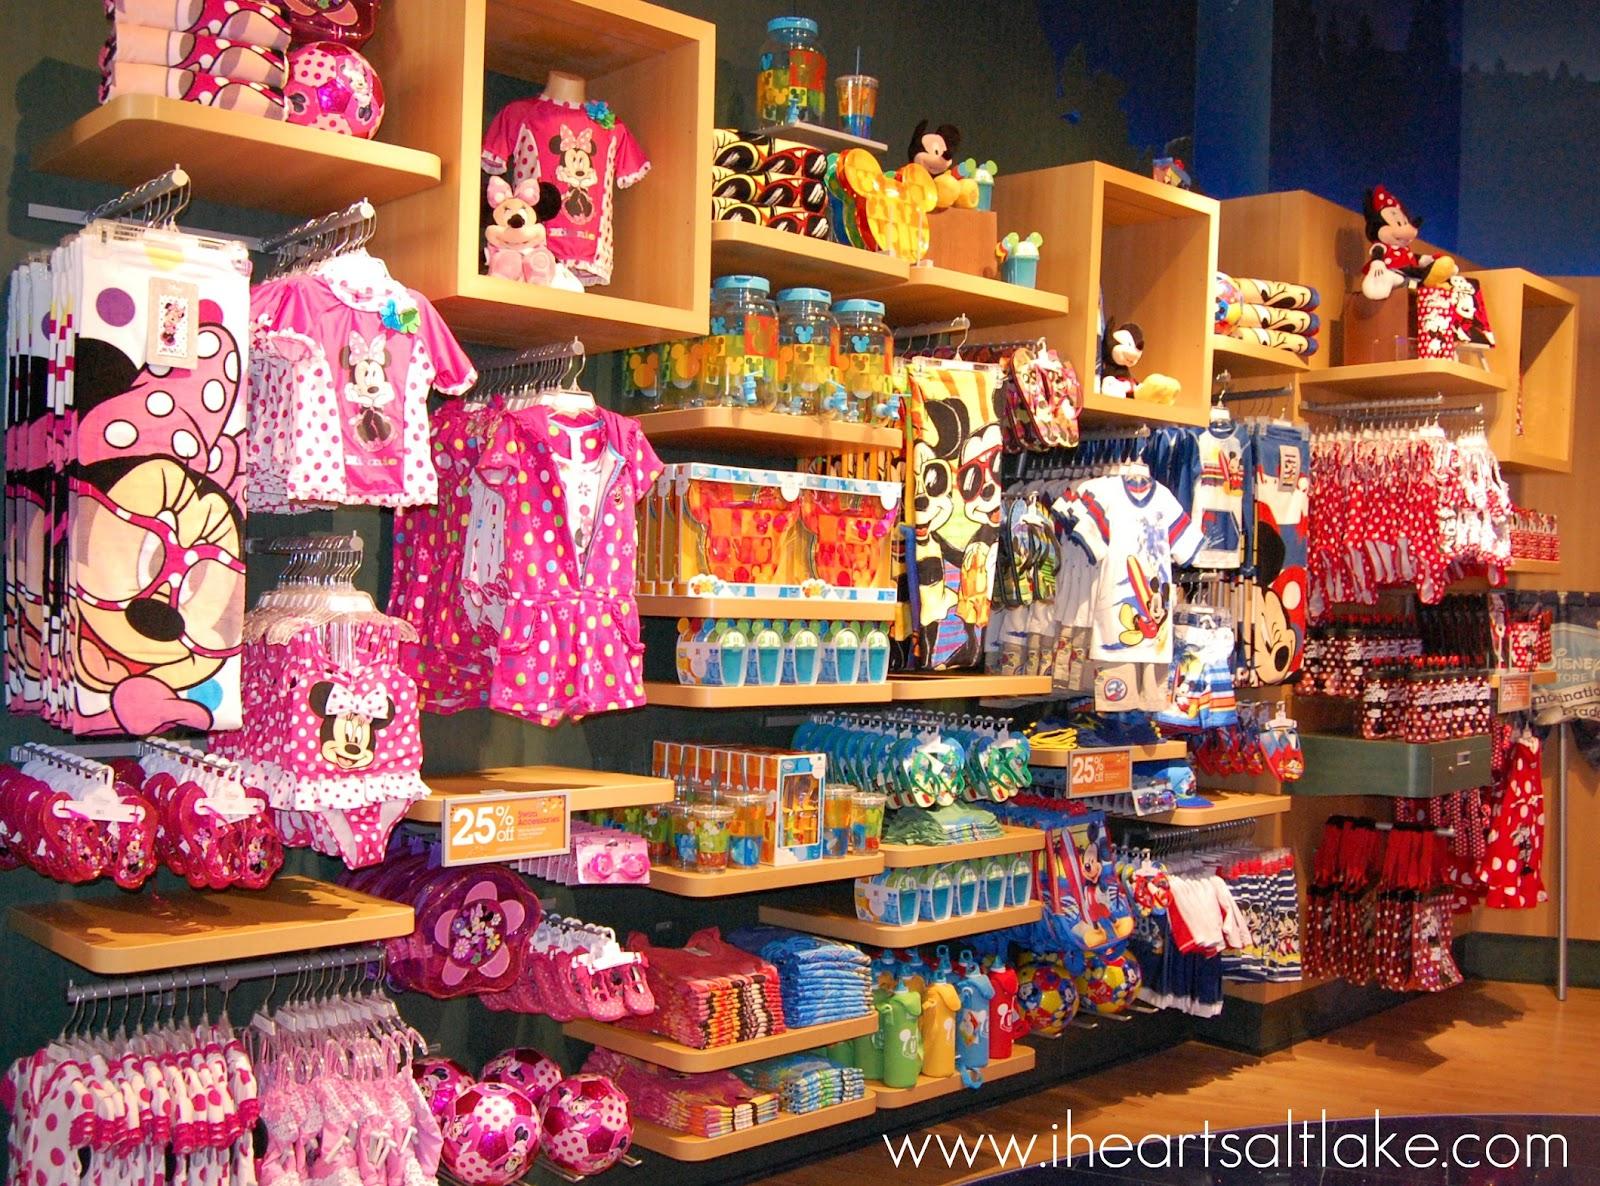 I Heart Salt Lake: March 2012  I Heart Salt La...